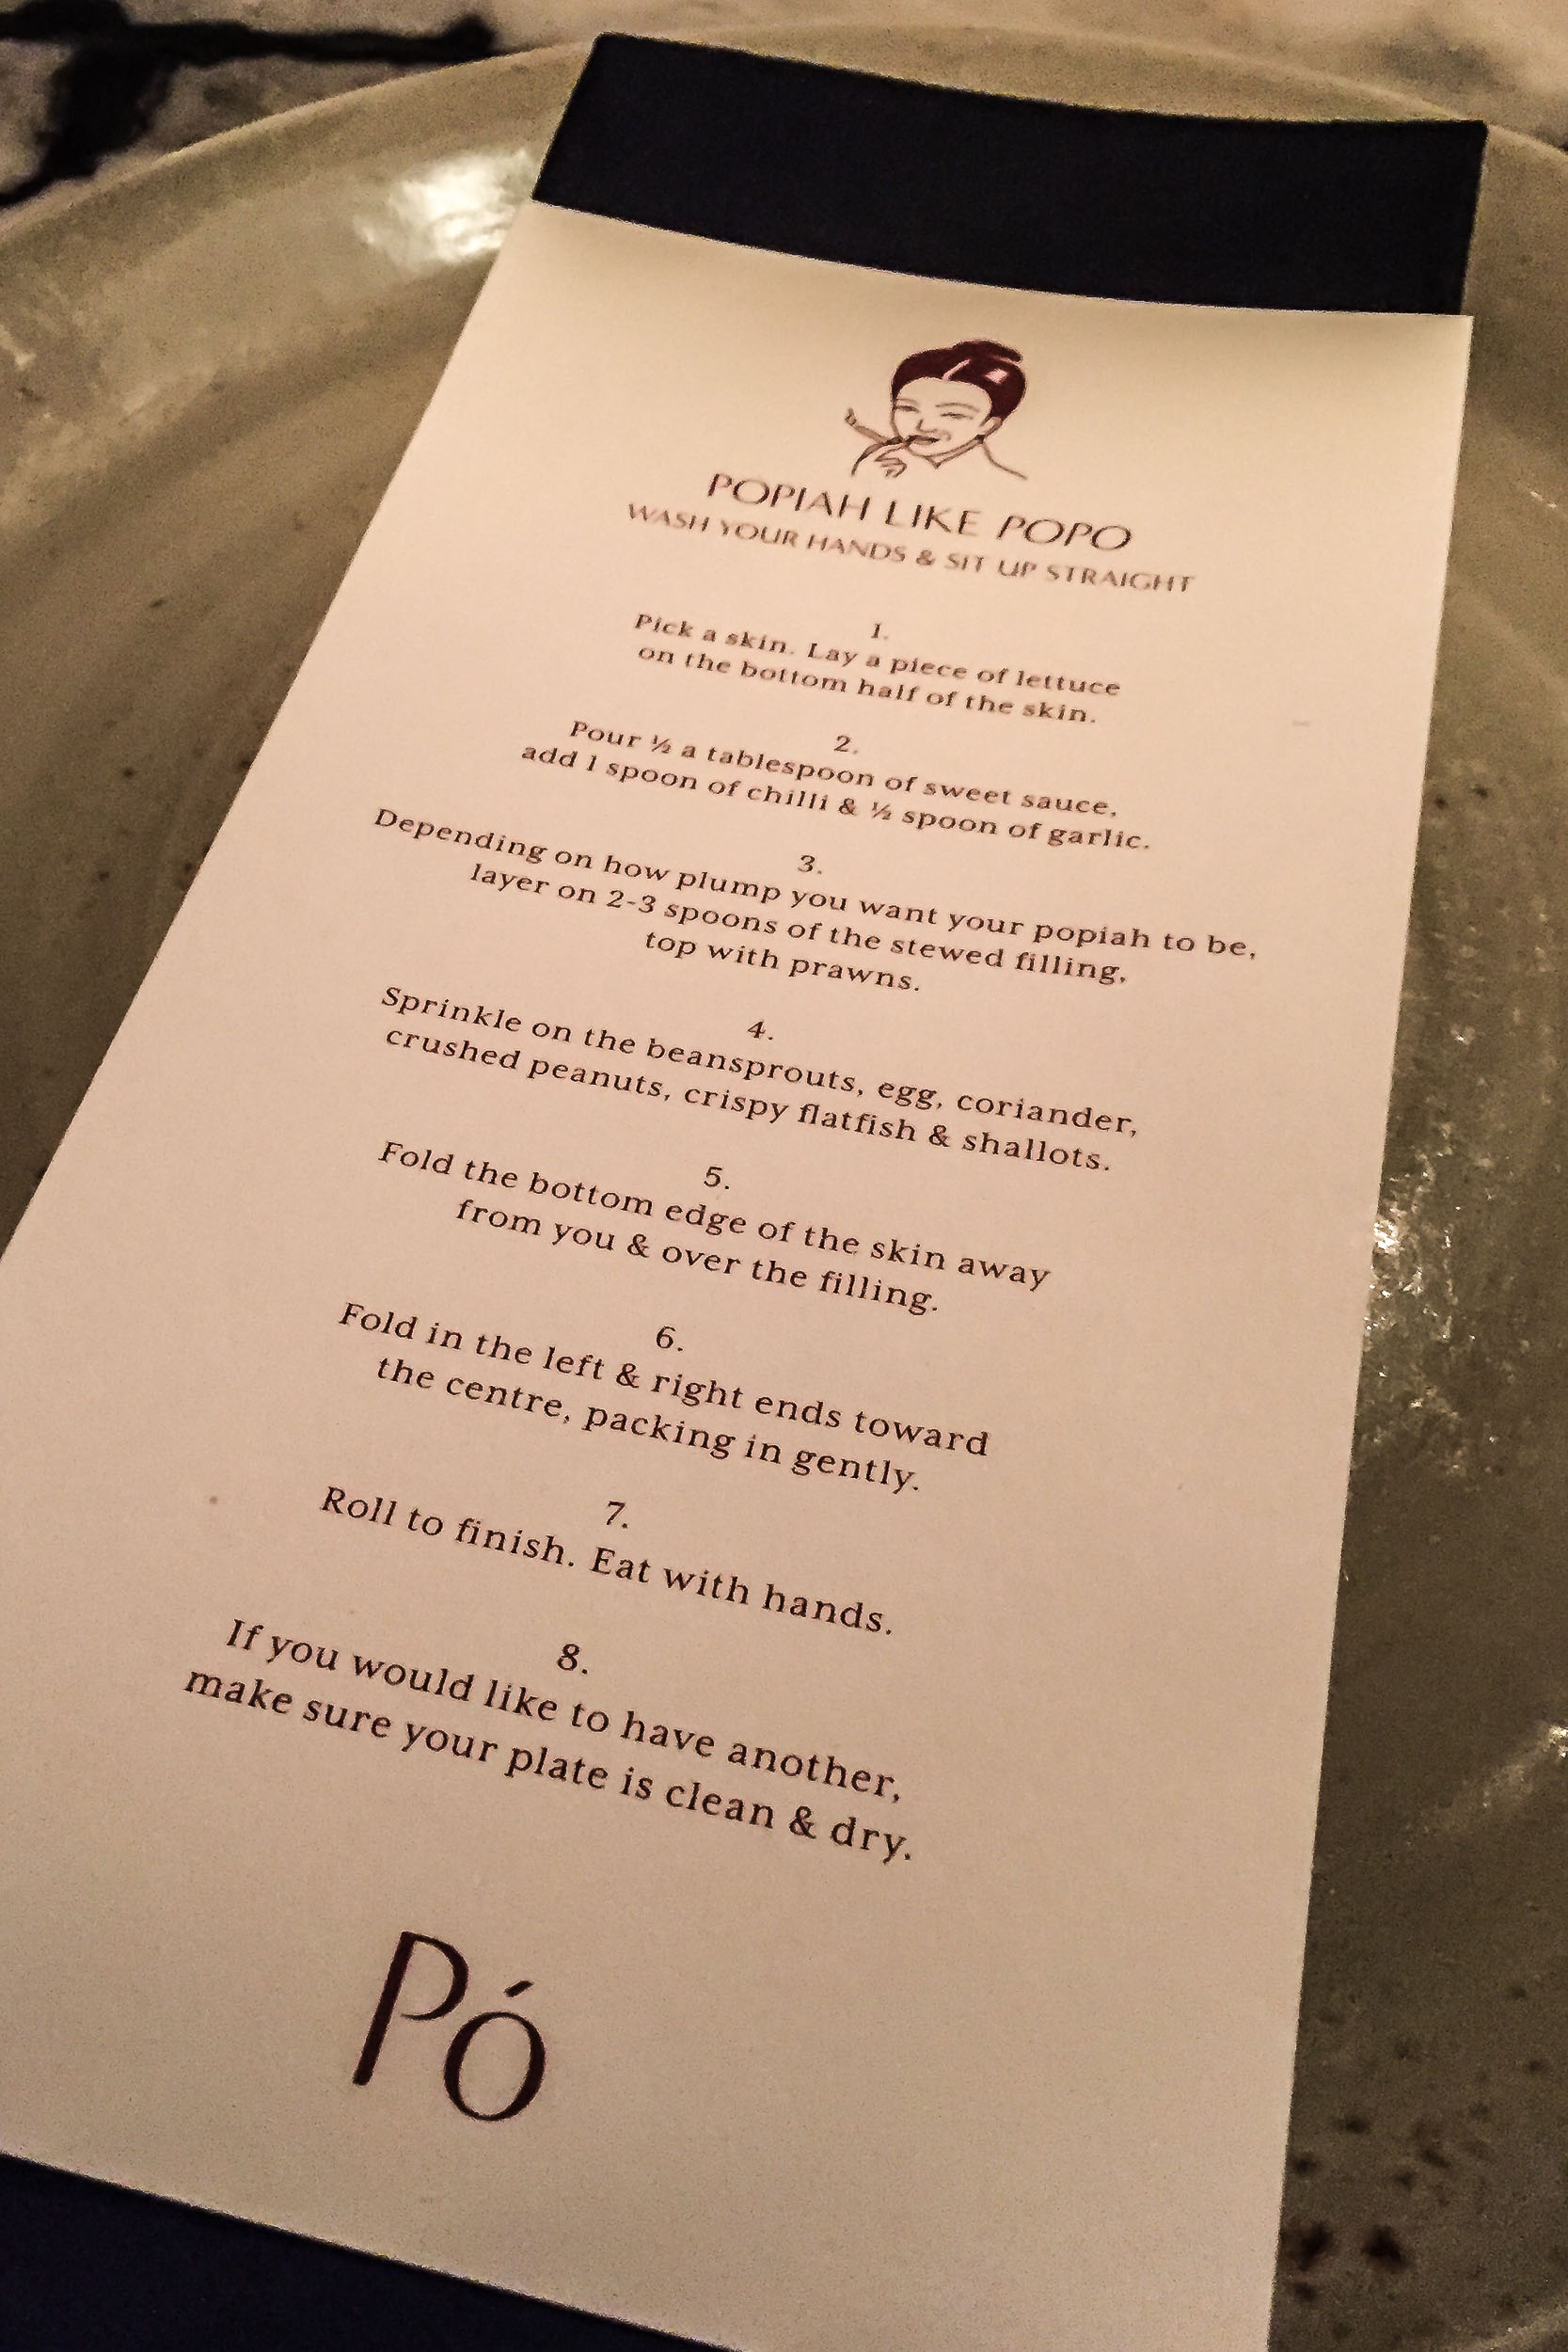 How to Make a Popiah (like Popo), Po Restaurant, Singapore